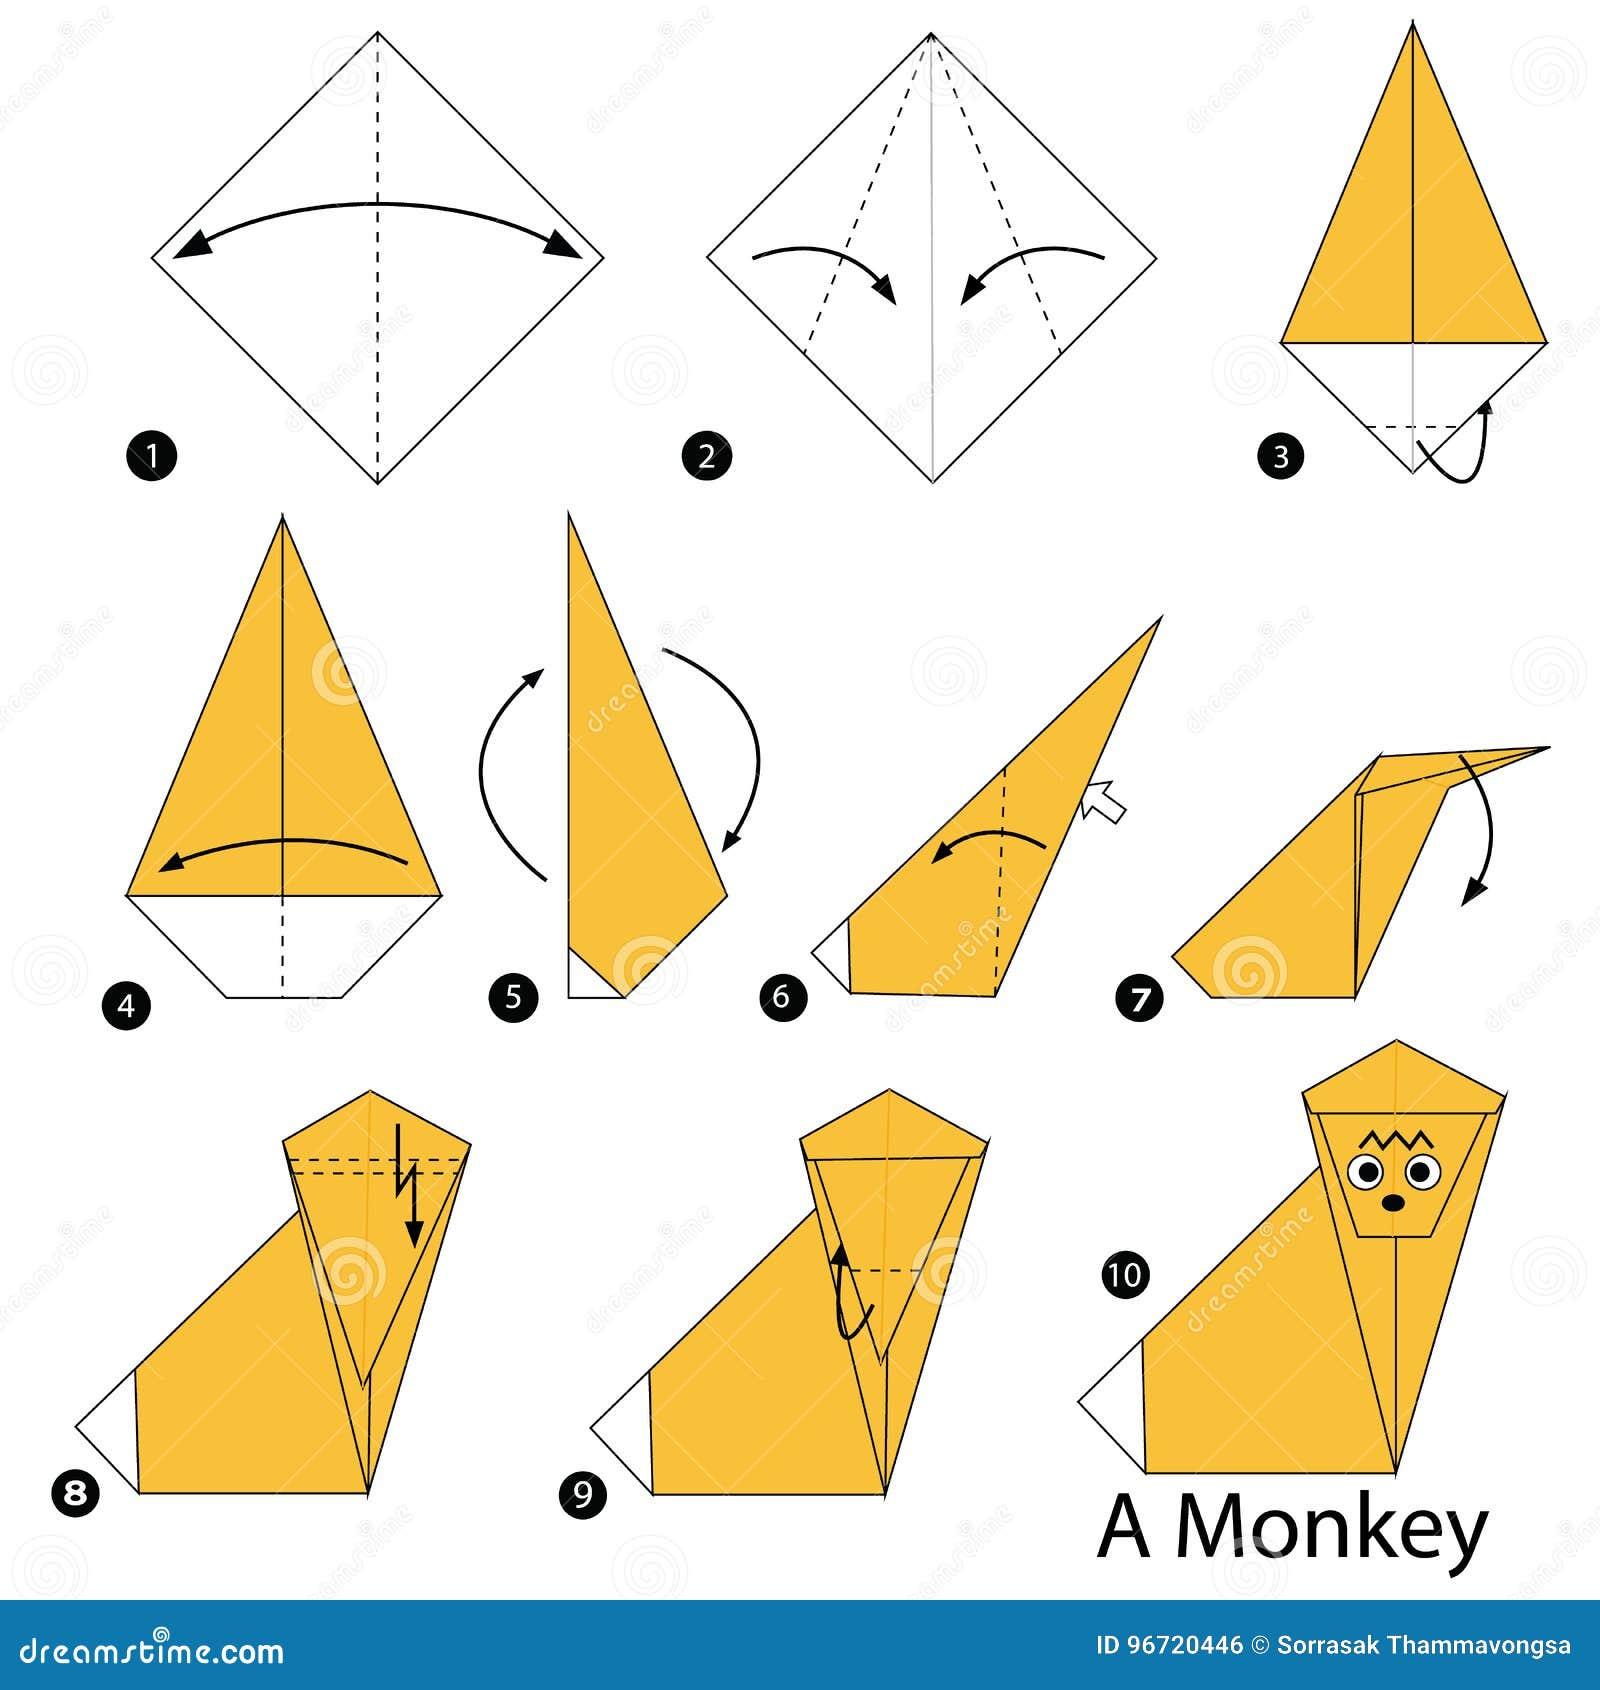 Origami Koala Face Folding Instructions - How to Fold an Origami ...   1390x1300